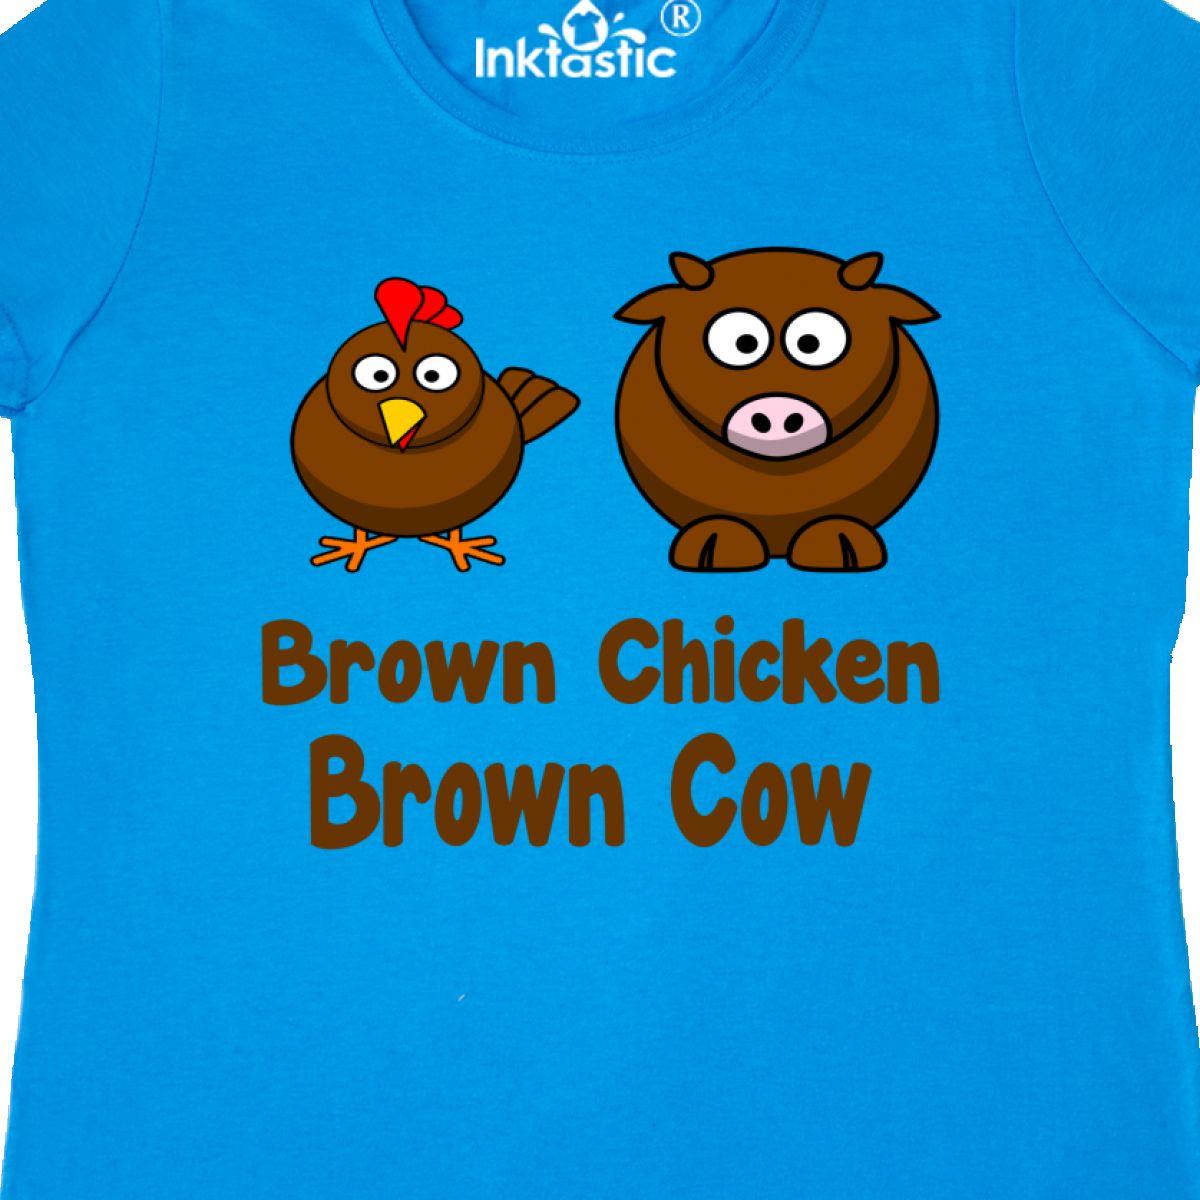 91ee6b629 Inktastic Brown Chicken Brown Cow Women's T-Shirt Farm Clothing ...